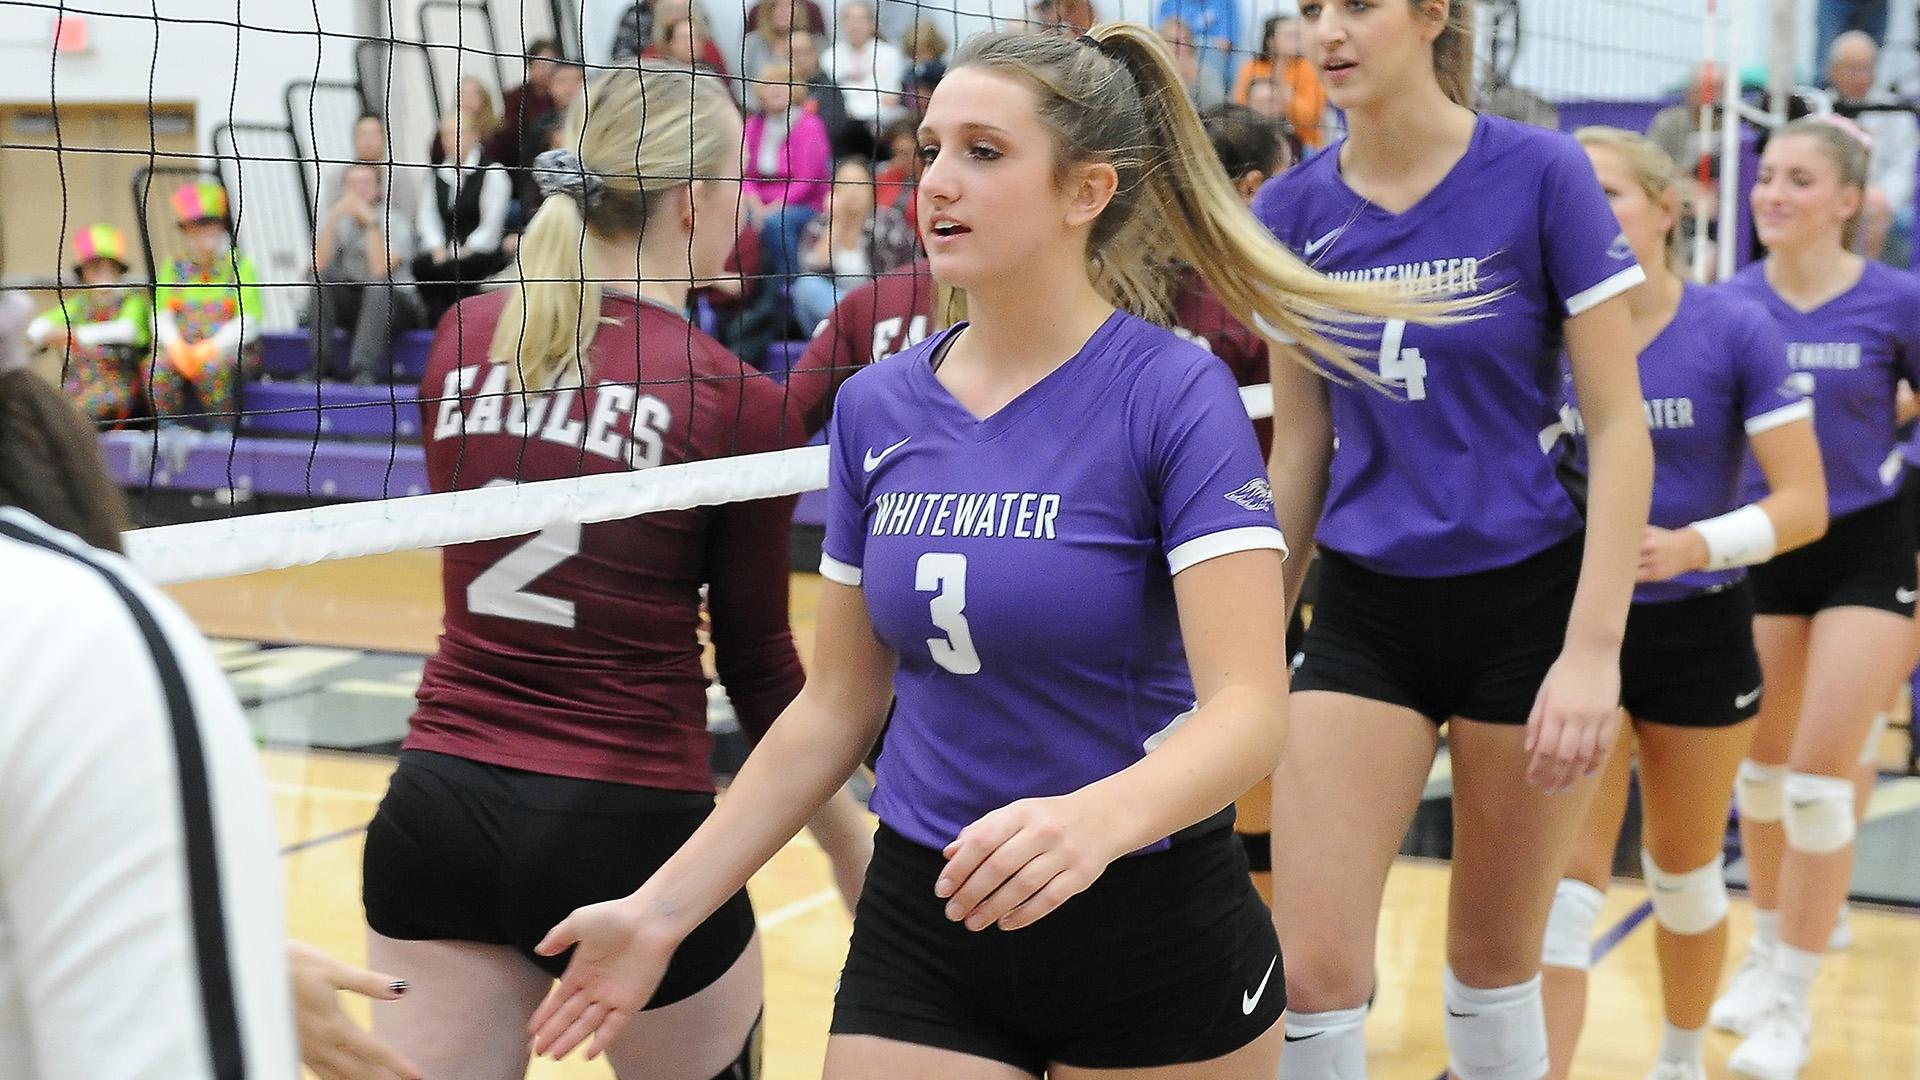 Katie Bartelt 2018 Volleyball University Of Wisconsin Whitewater Athletics